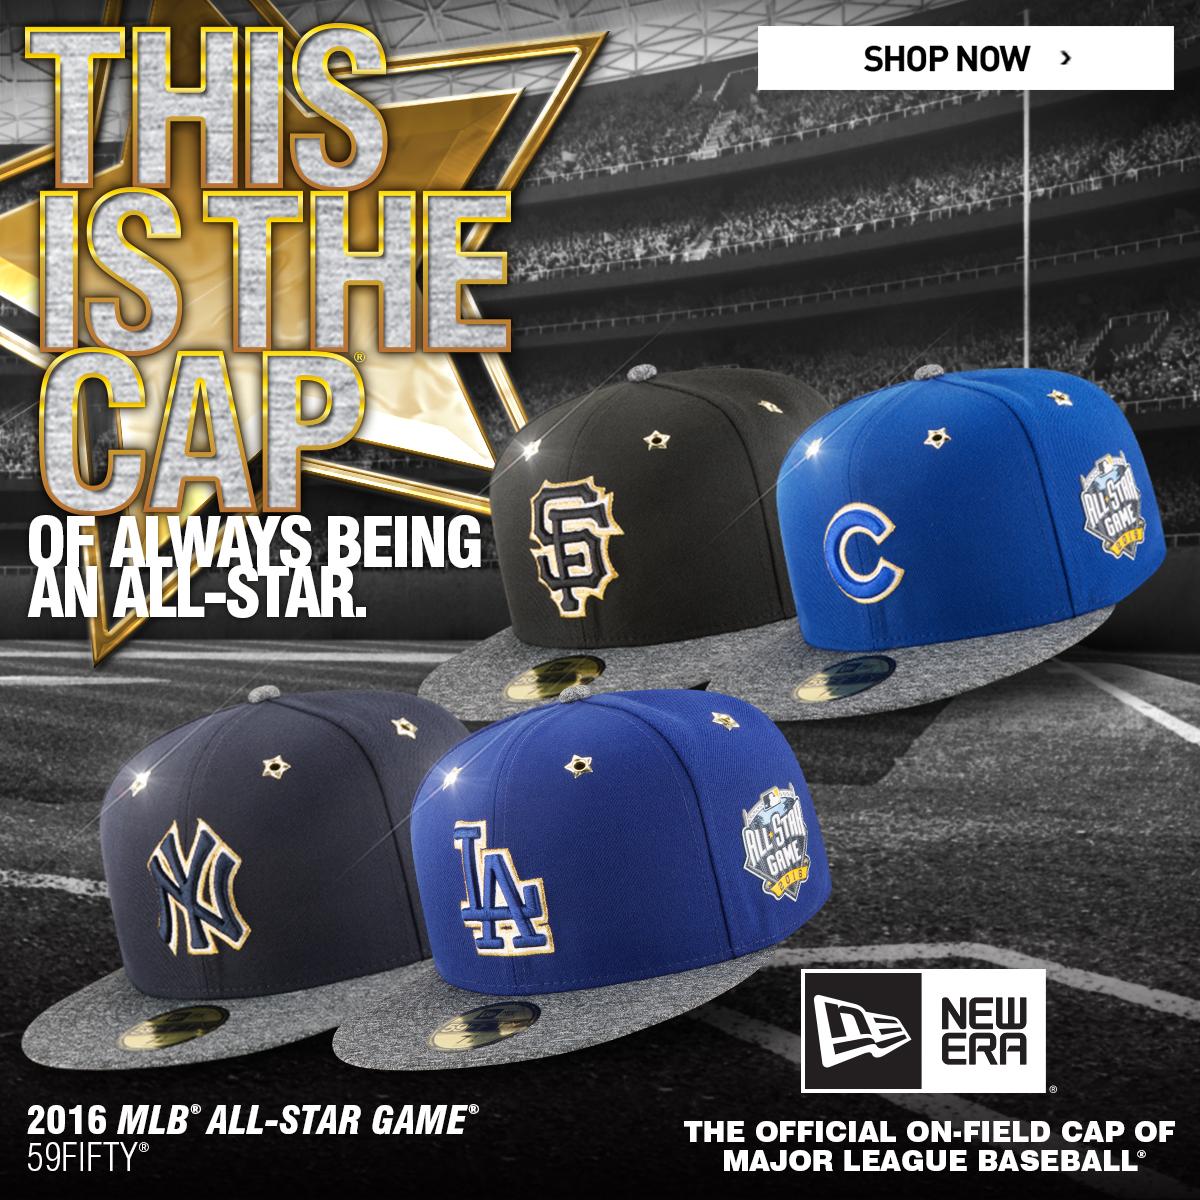 JUST LAUNCHED  MLB x New Era All Star Game Caps  fbd4a7e1a4